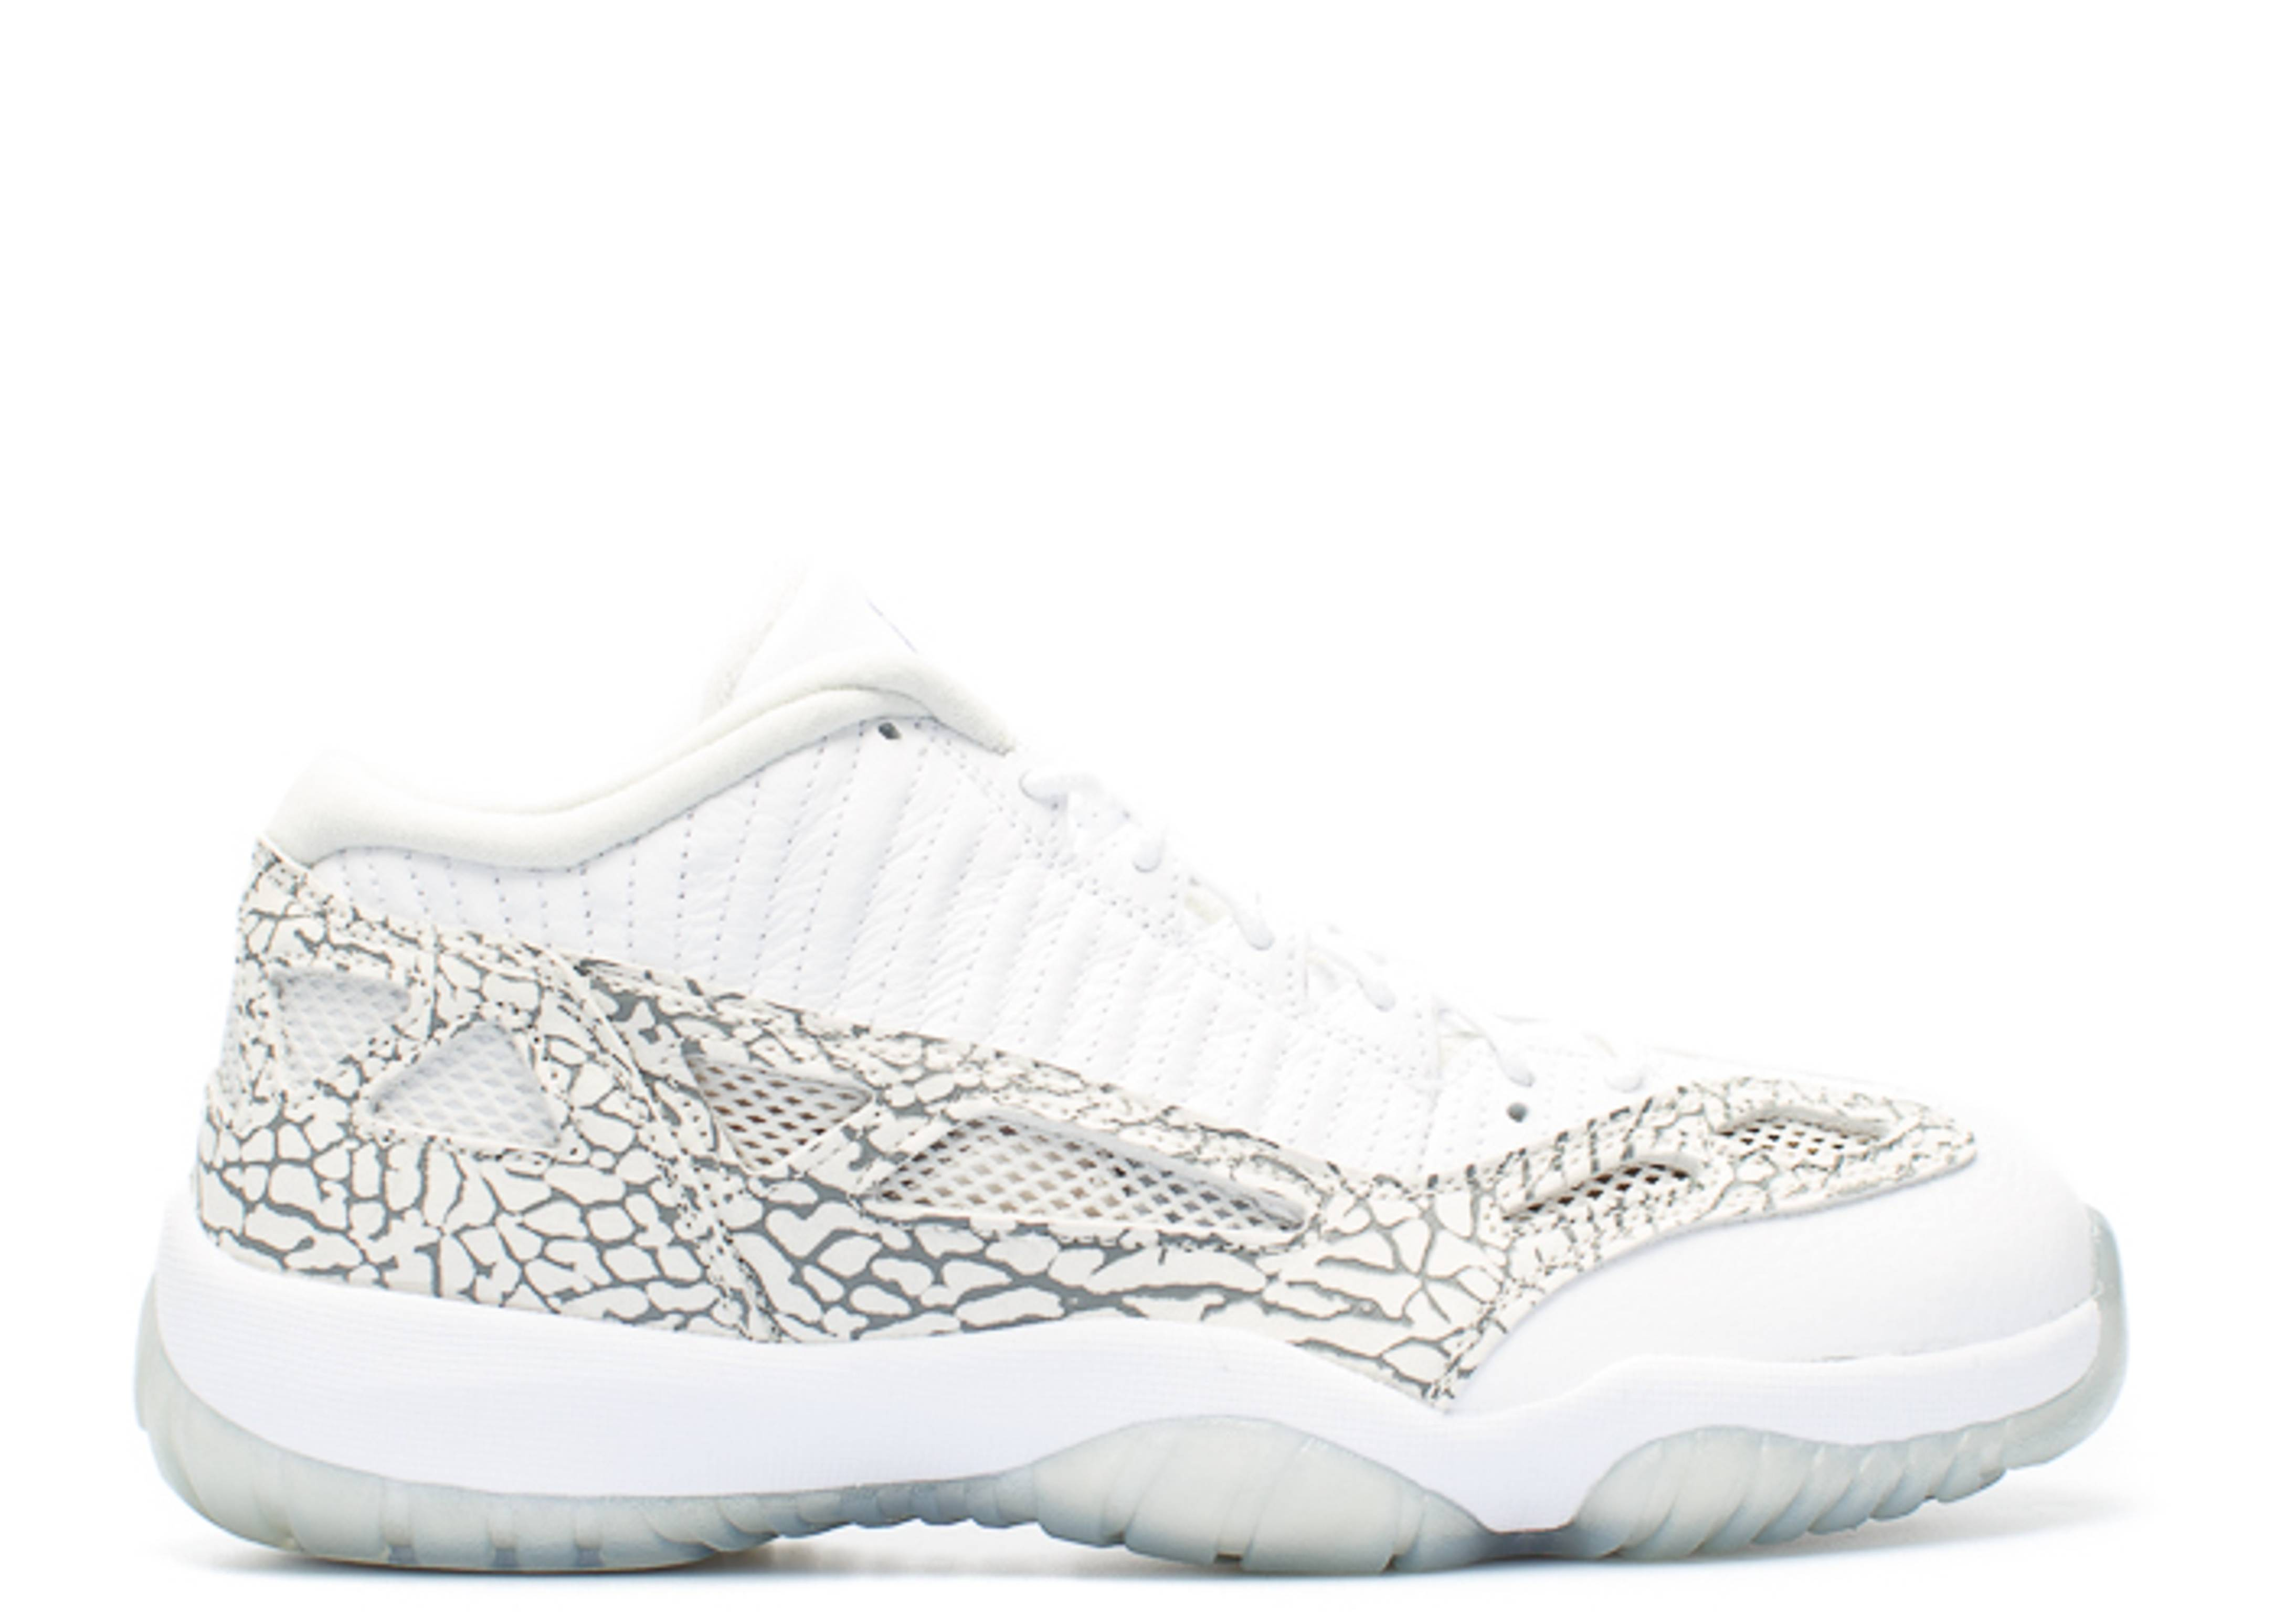 Jordan 11 Low White